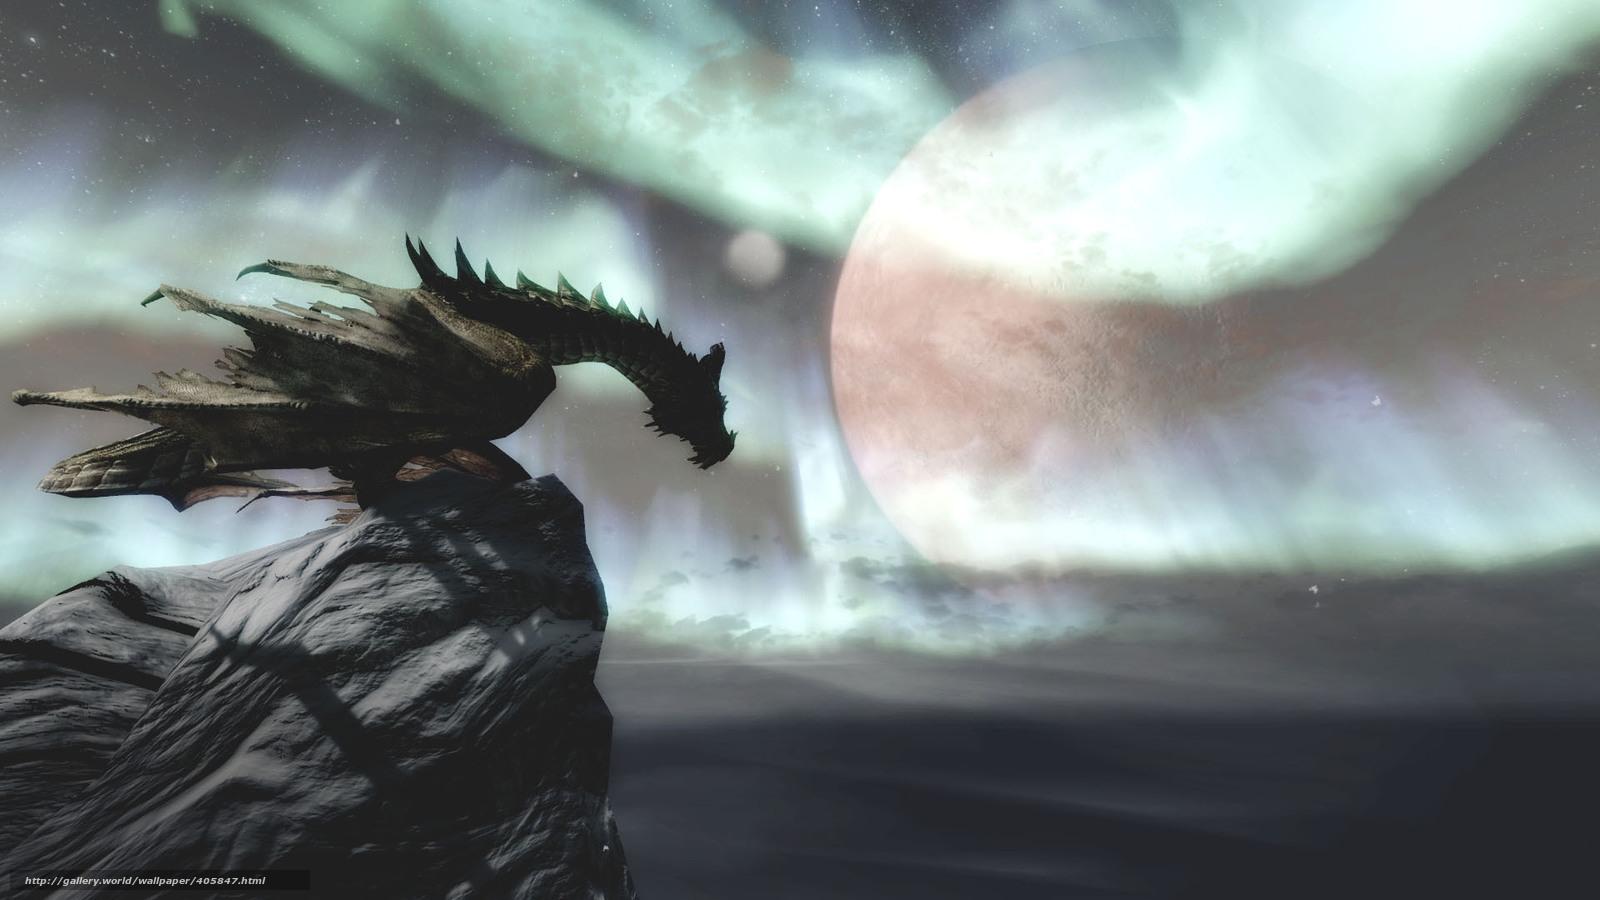 Download wallpaper Skyrim dragon game desktop wallpaper in 1600x900